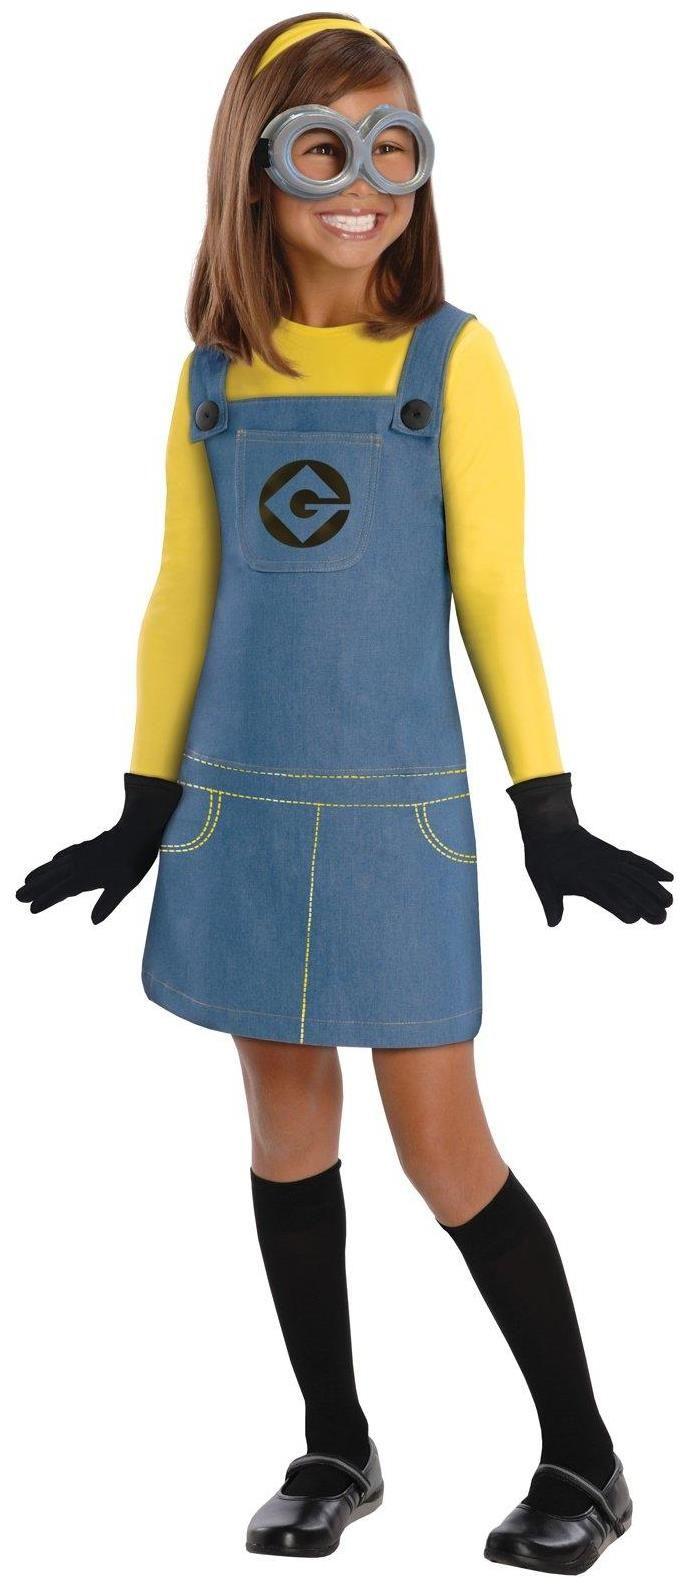 PartyBell.com - Despicable Me 2 - Female #Minion Child Costume